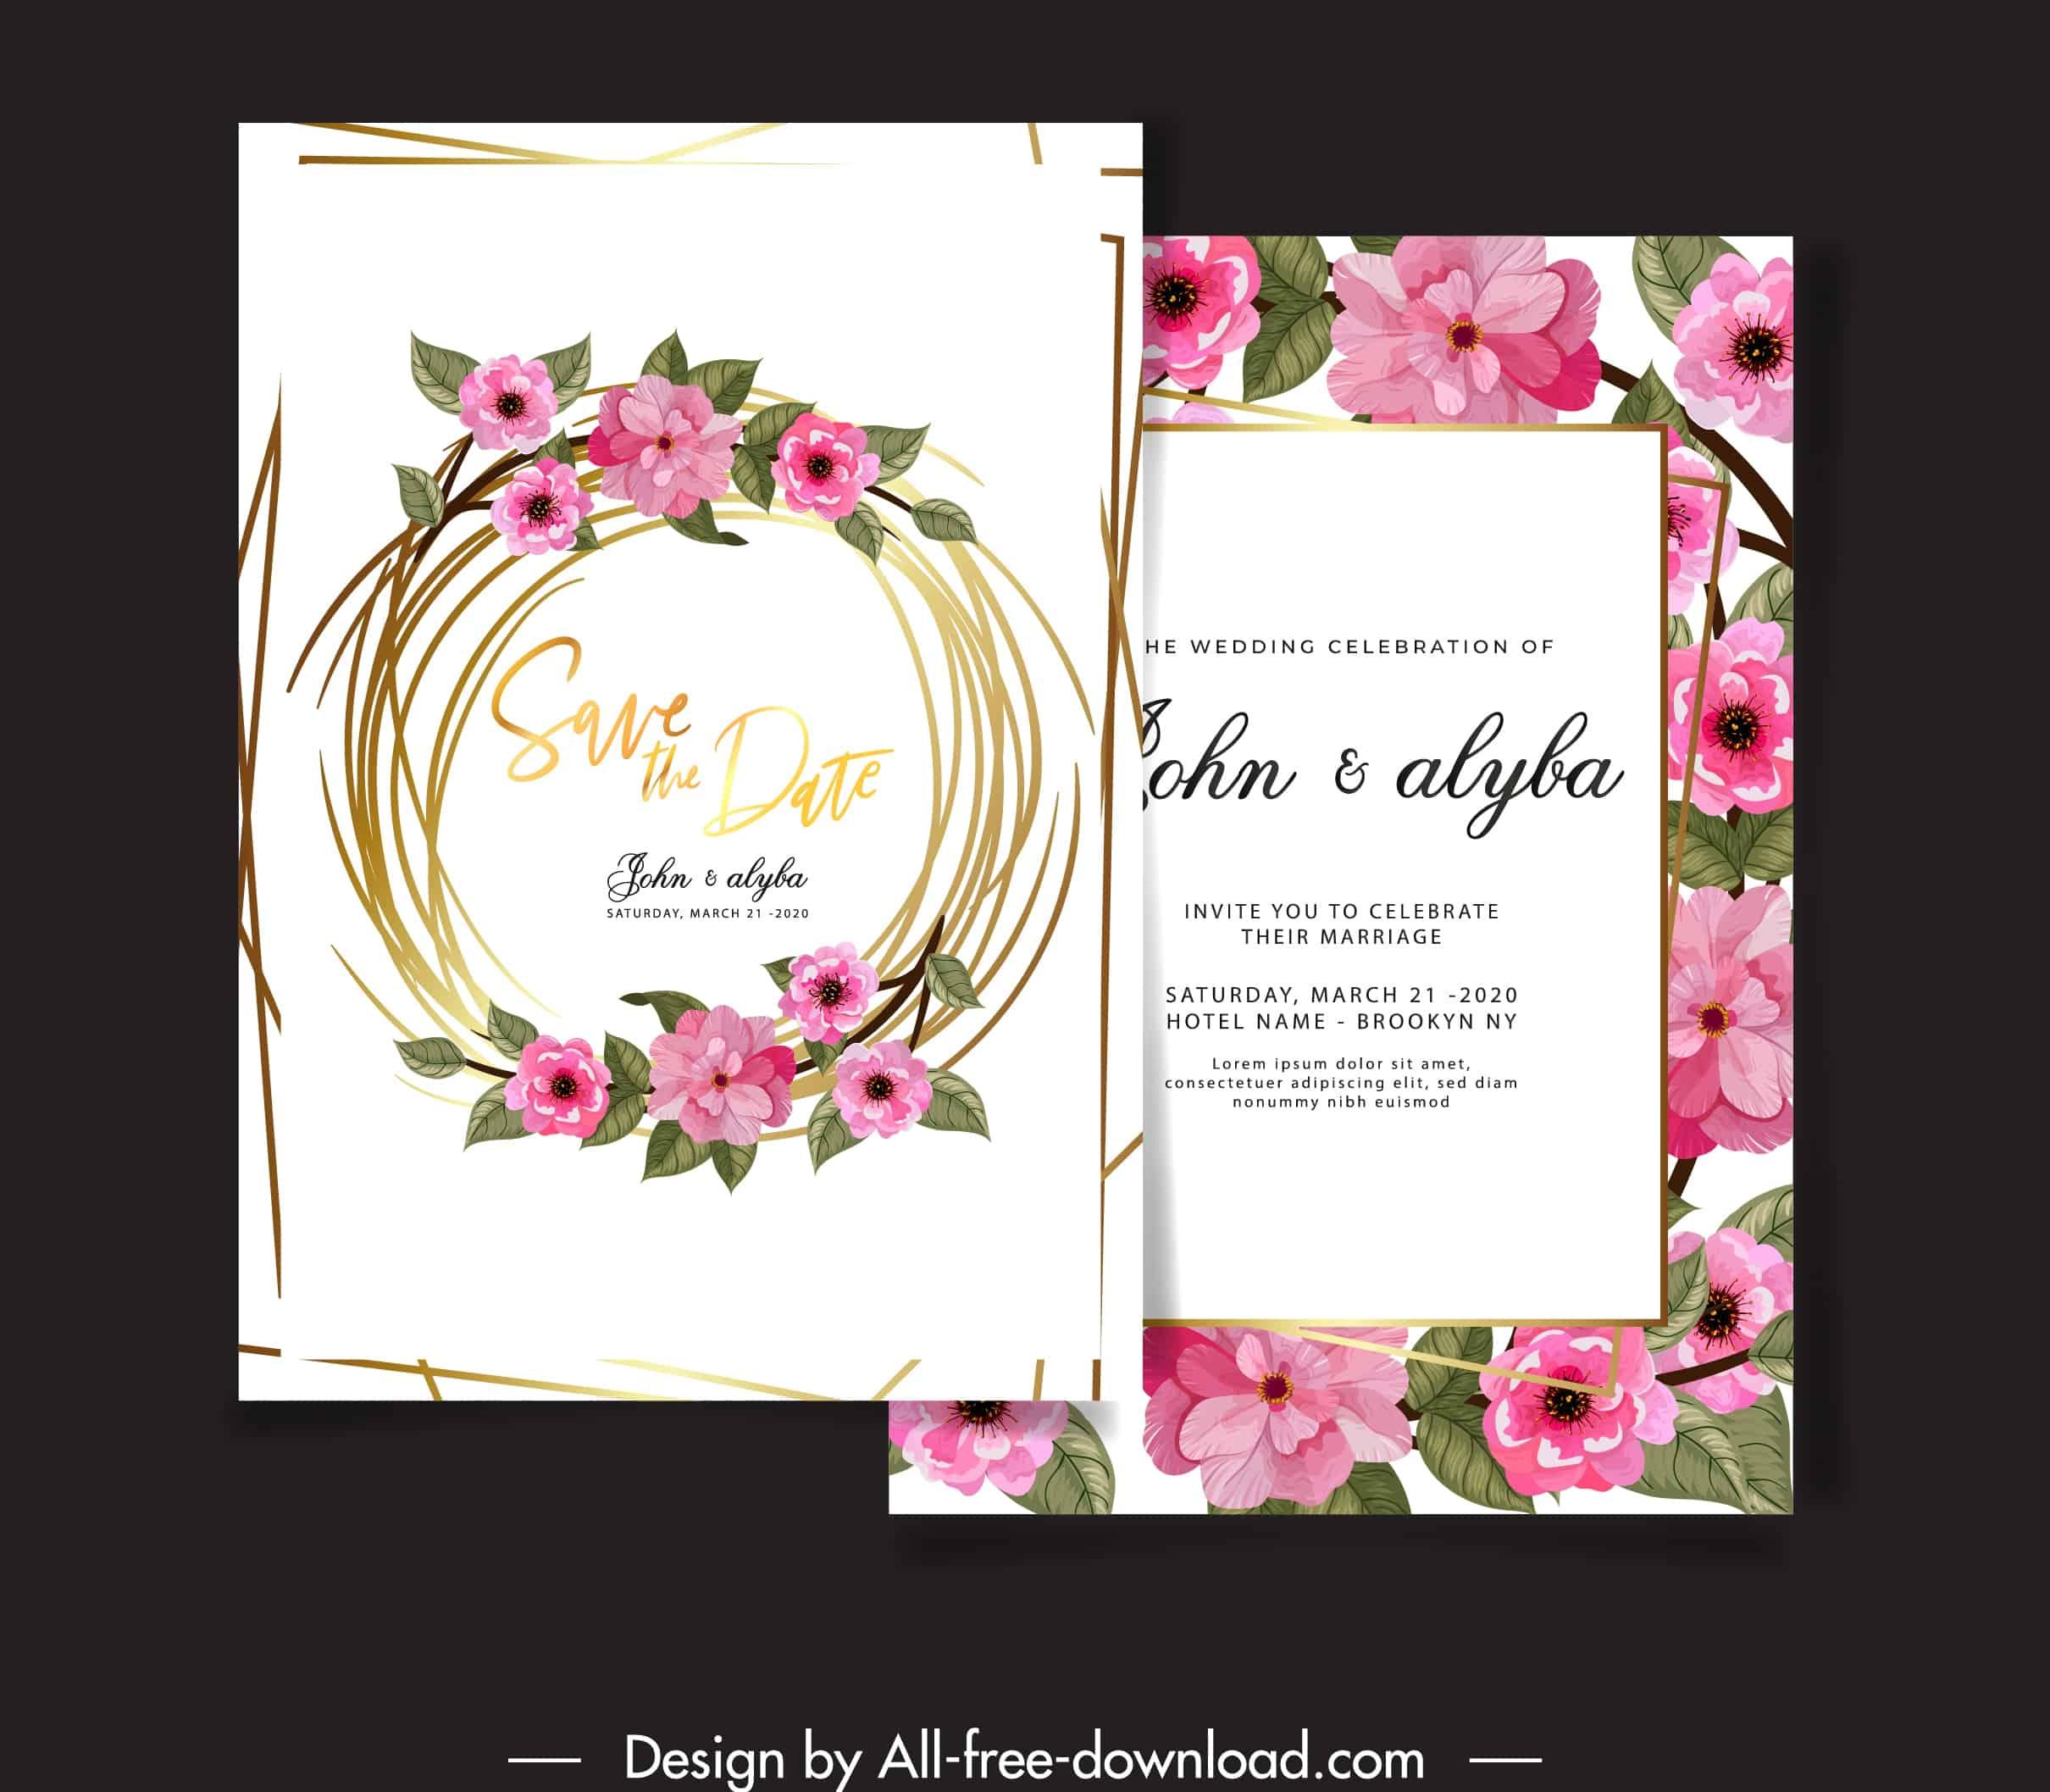 Blooming Wreath - Wedding Invitation